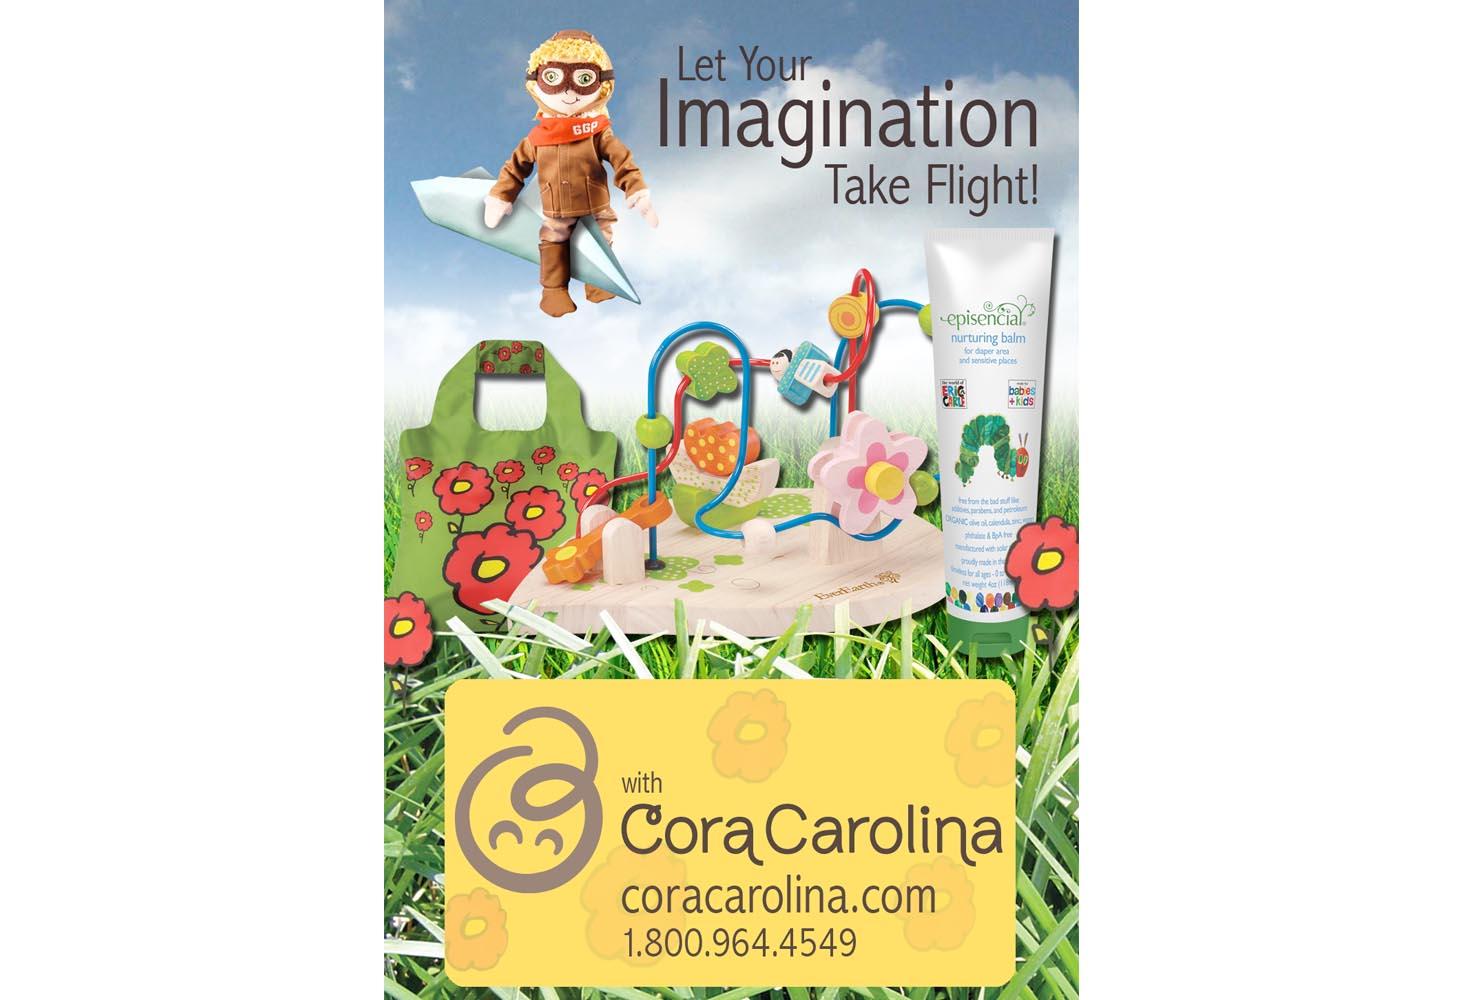 Cora Carolina - A Toy Boutique Web Ad